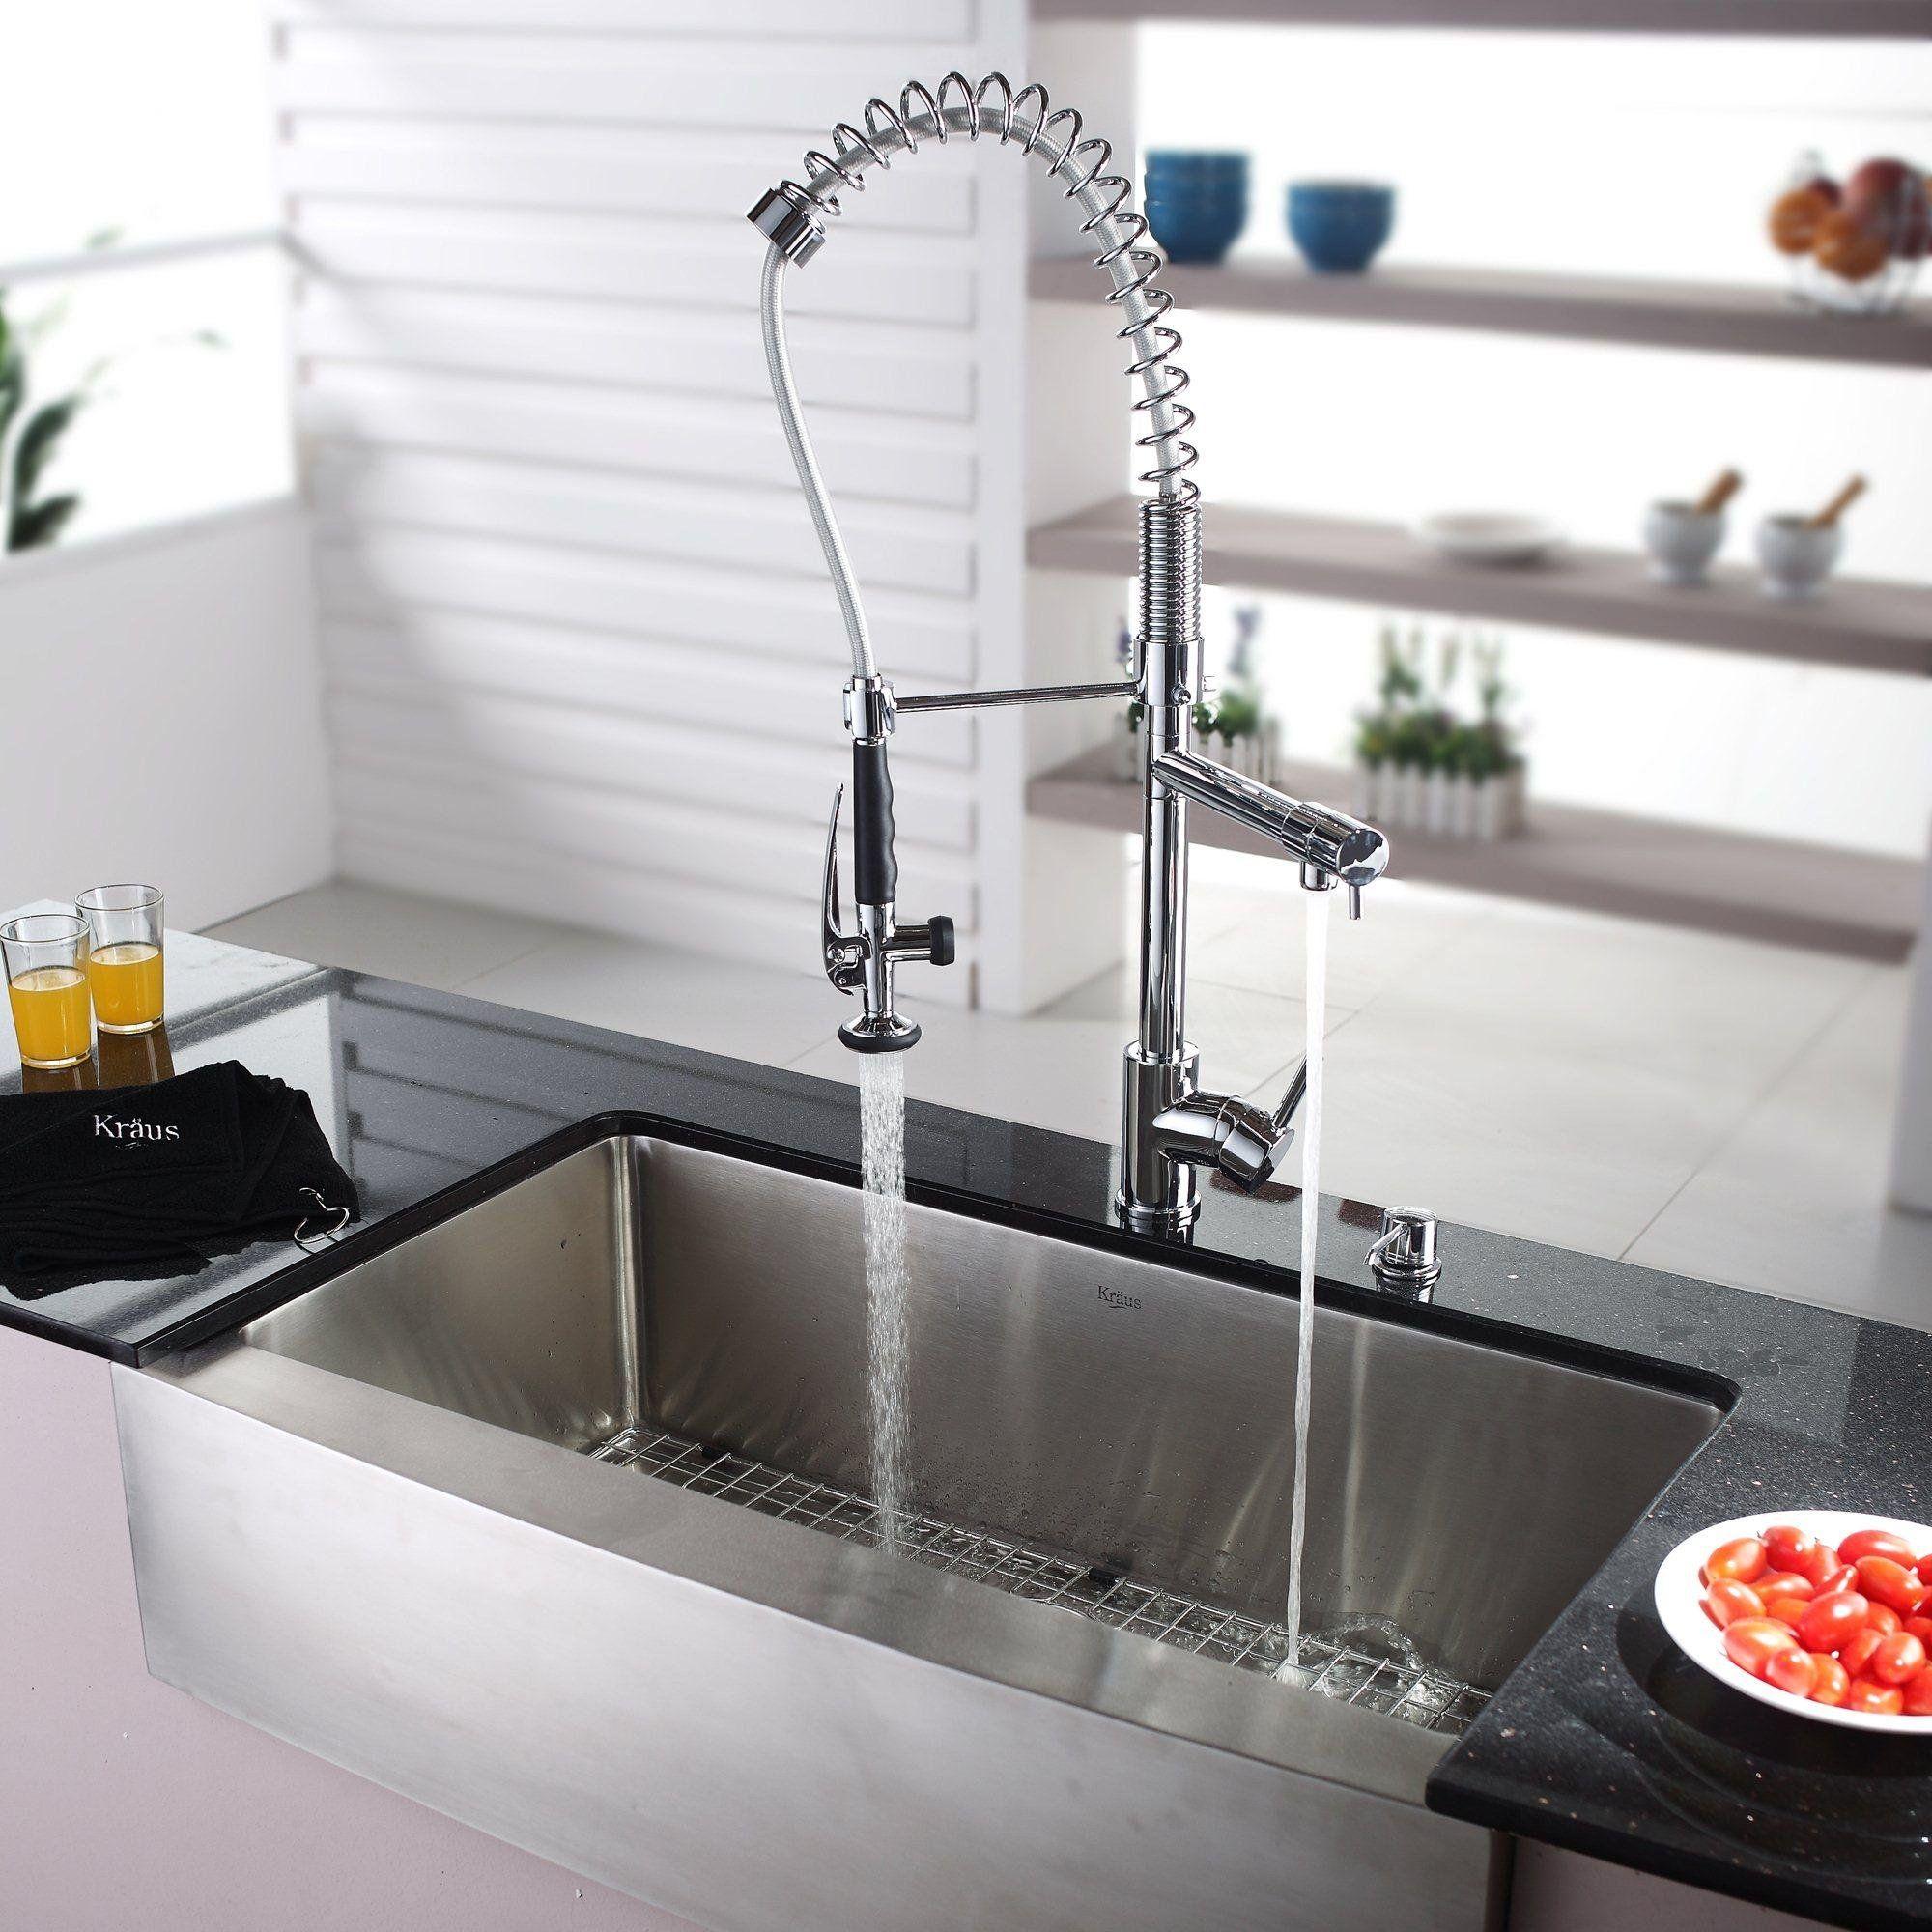 Kraus 36 X 21 Farmhouse Kitchen Sink With Faucet And Soap Dispenser Wayfair Farmhouse Sink Kitchen Best Kitchen Sinks Farmhouse Sink Faucet